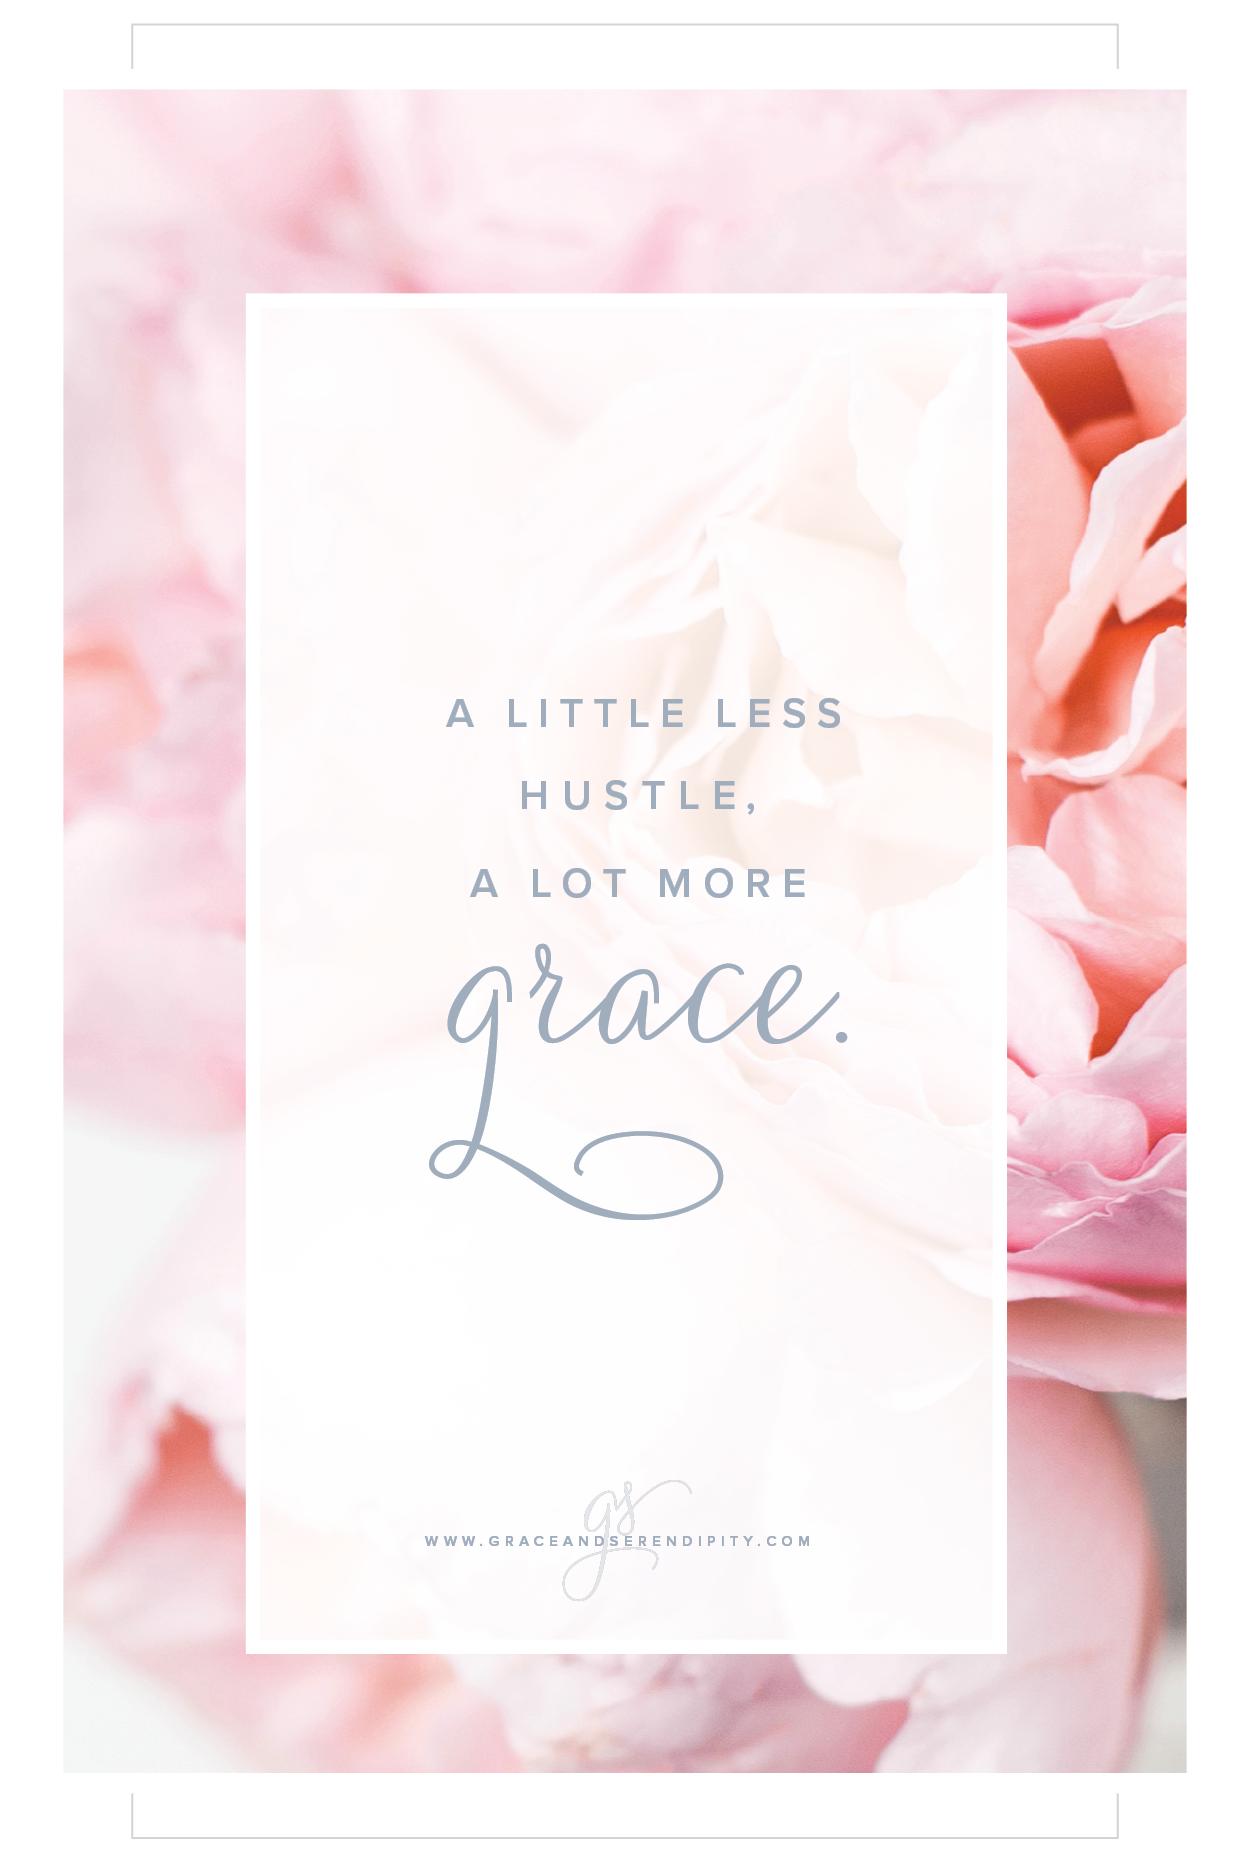 A little less hustle, a lot more grace - Grace and Serendipity